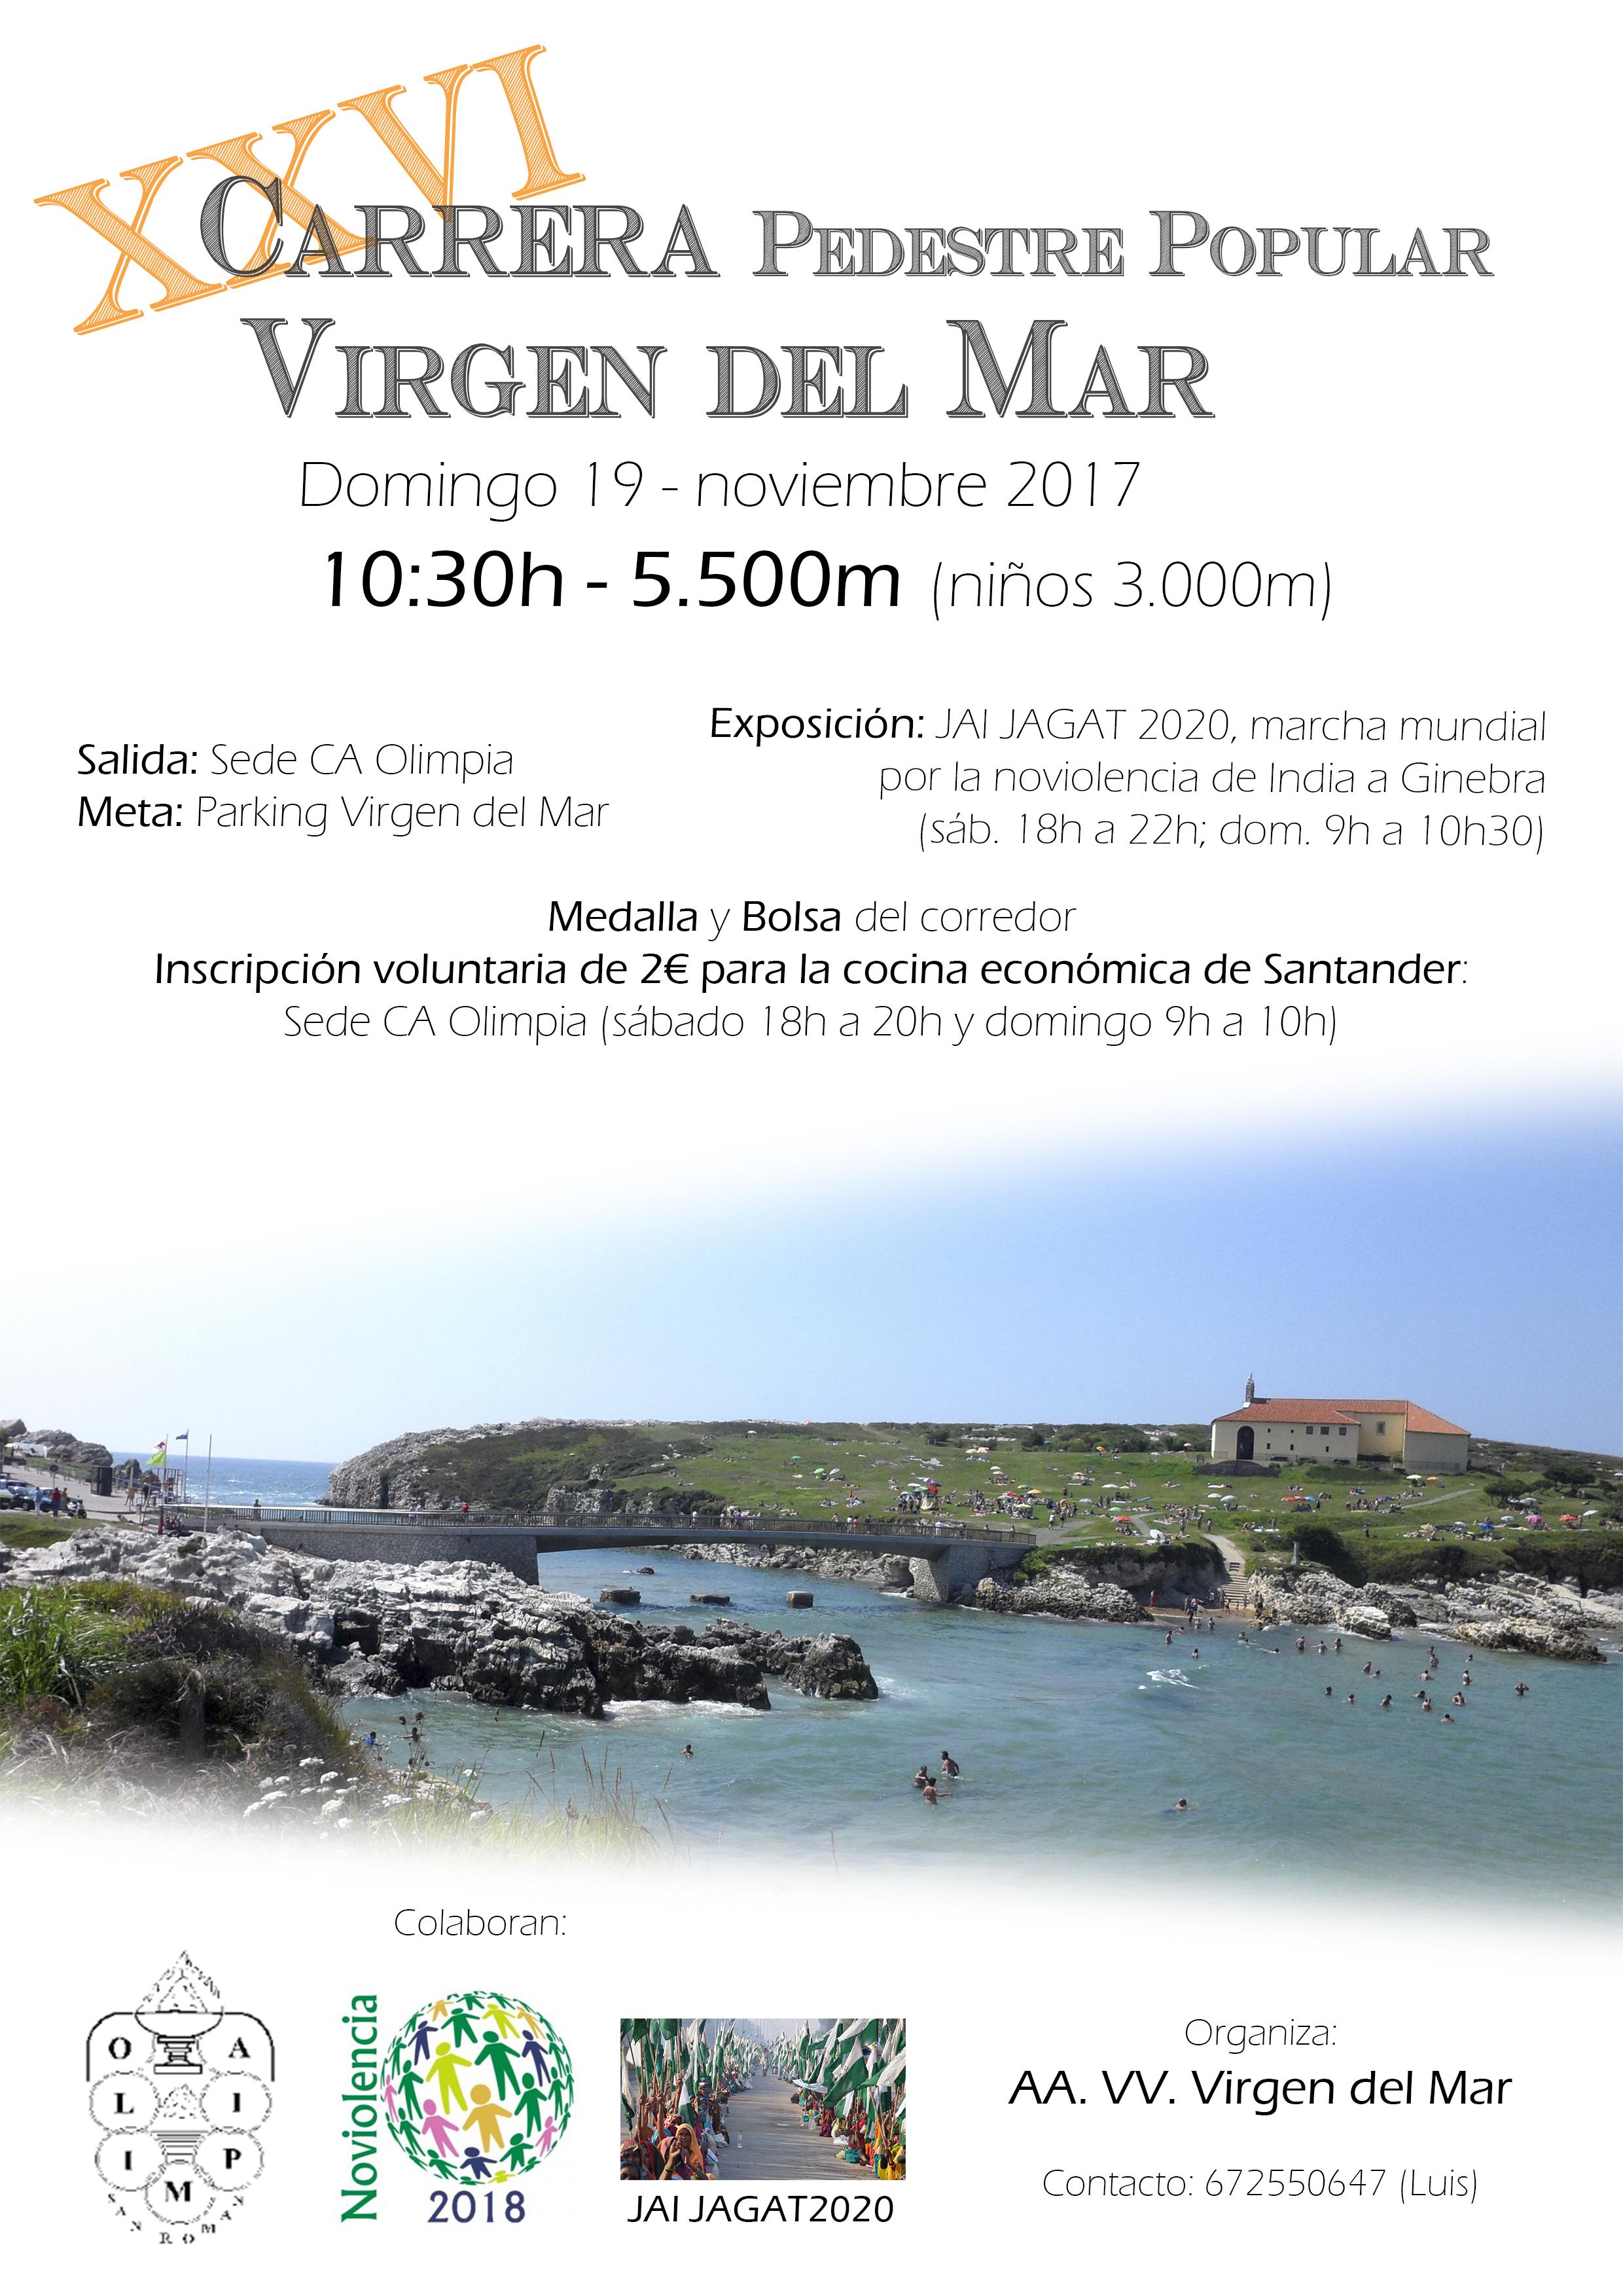 Santander xxvi carrera pedestre popular virgen del mar - Cocina economica santander ...